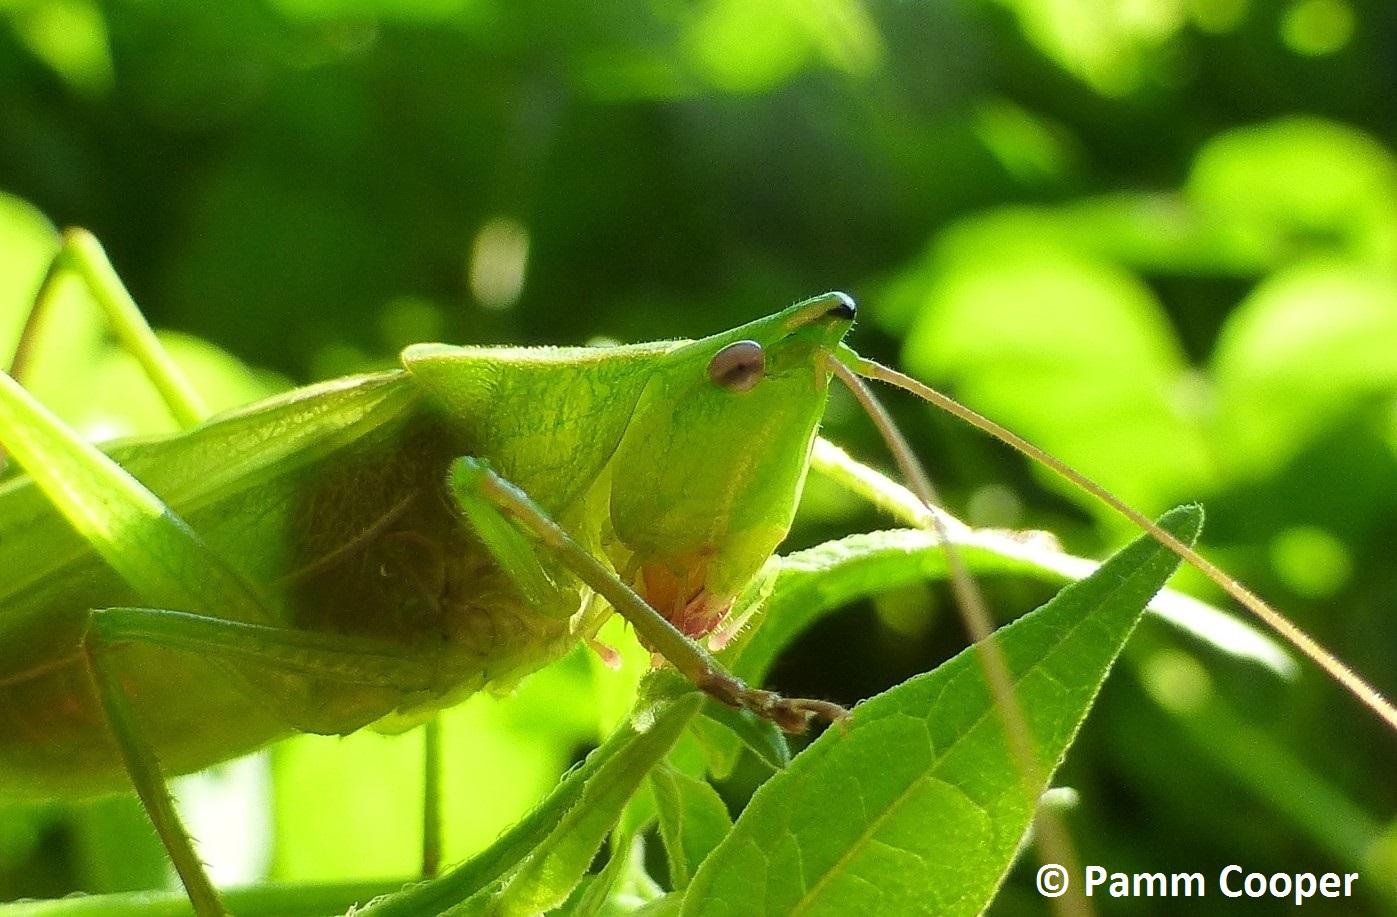 Conehead katydid neoconocephalus ssp.